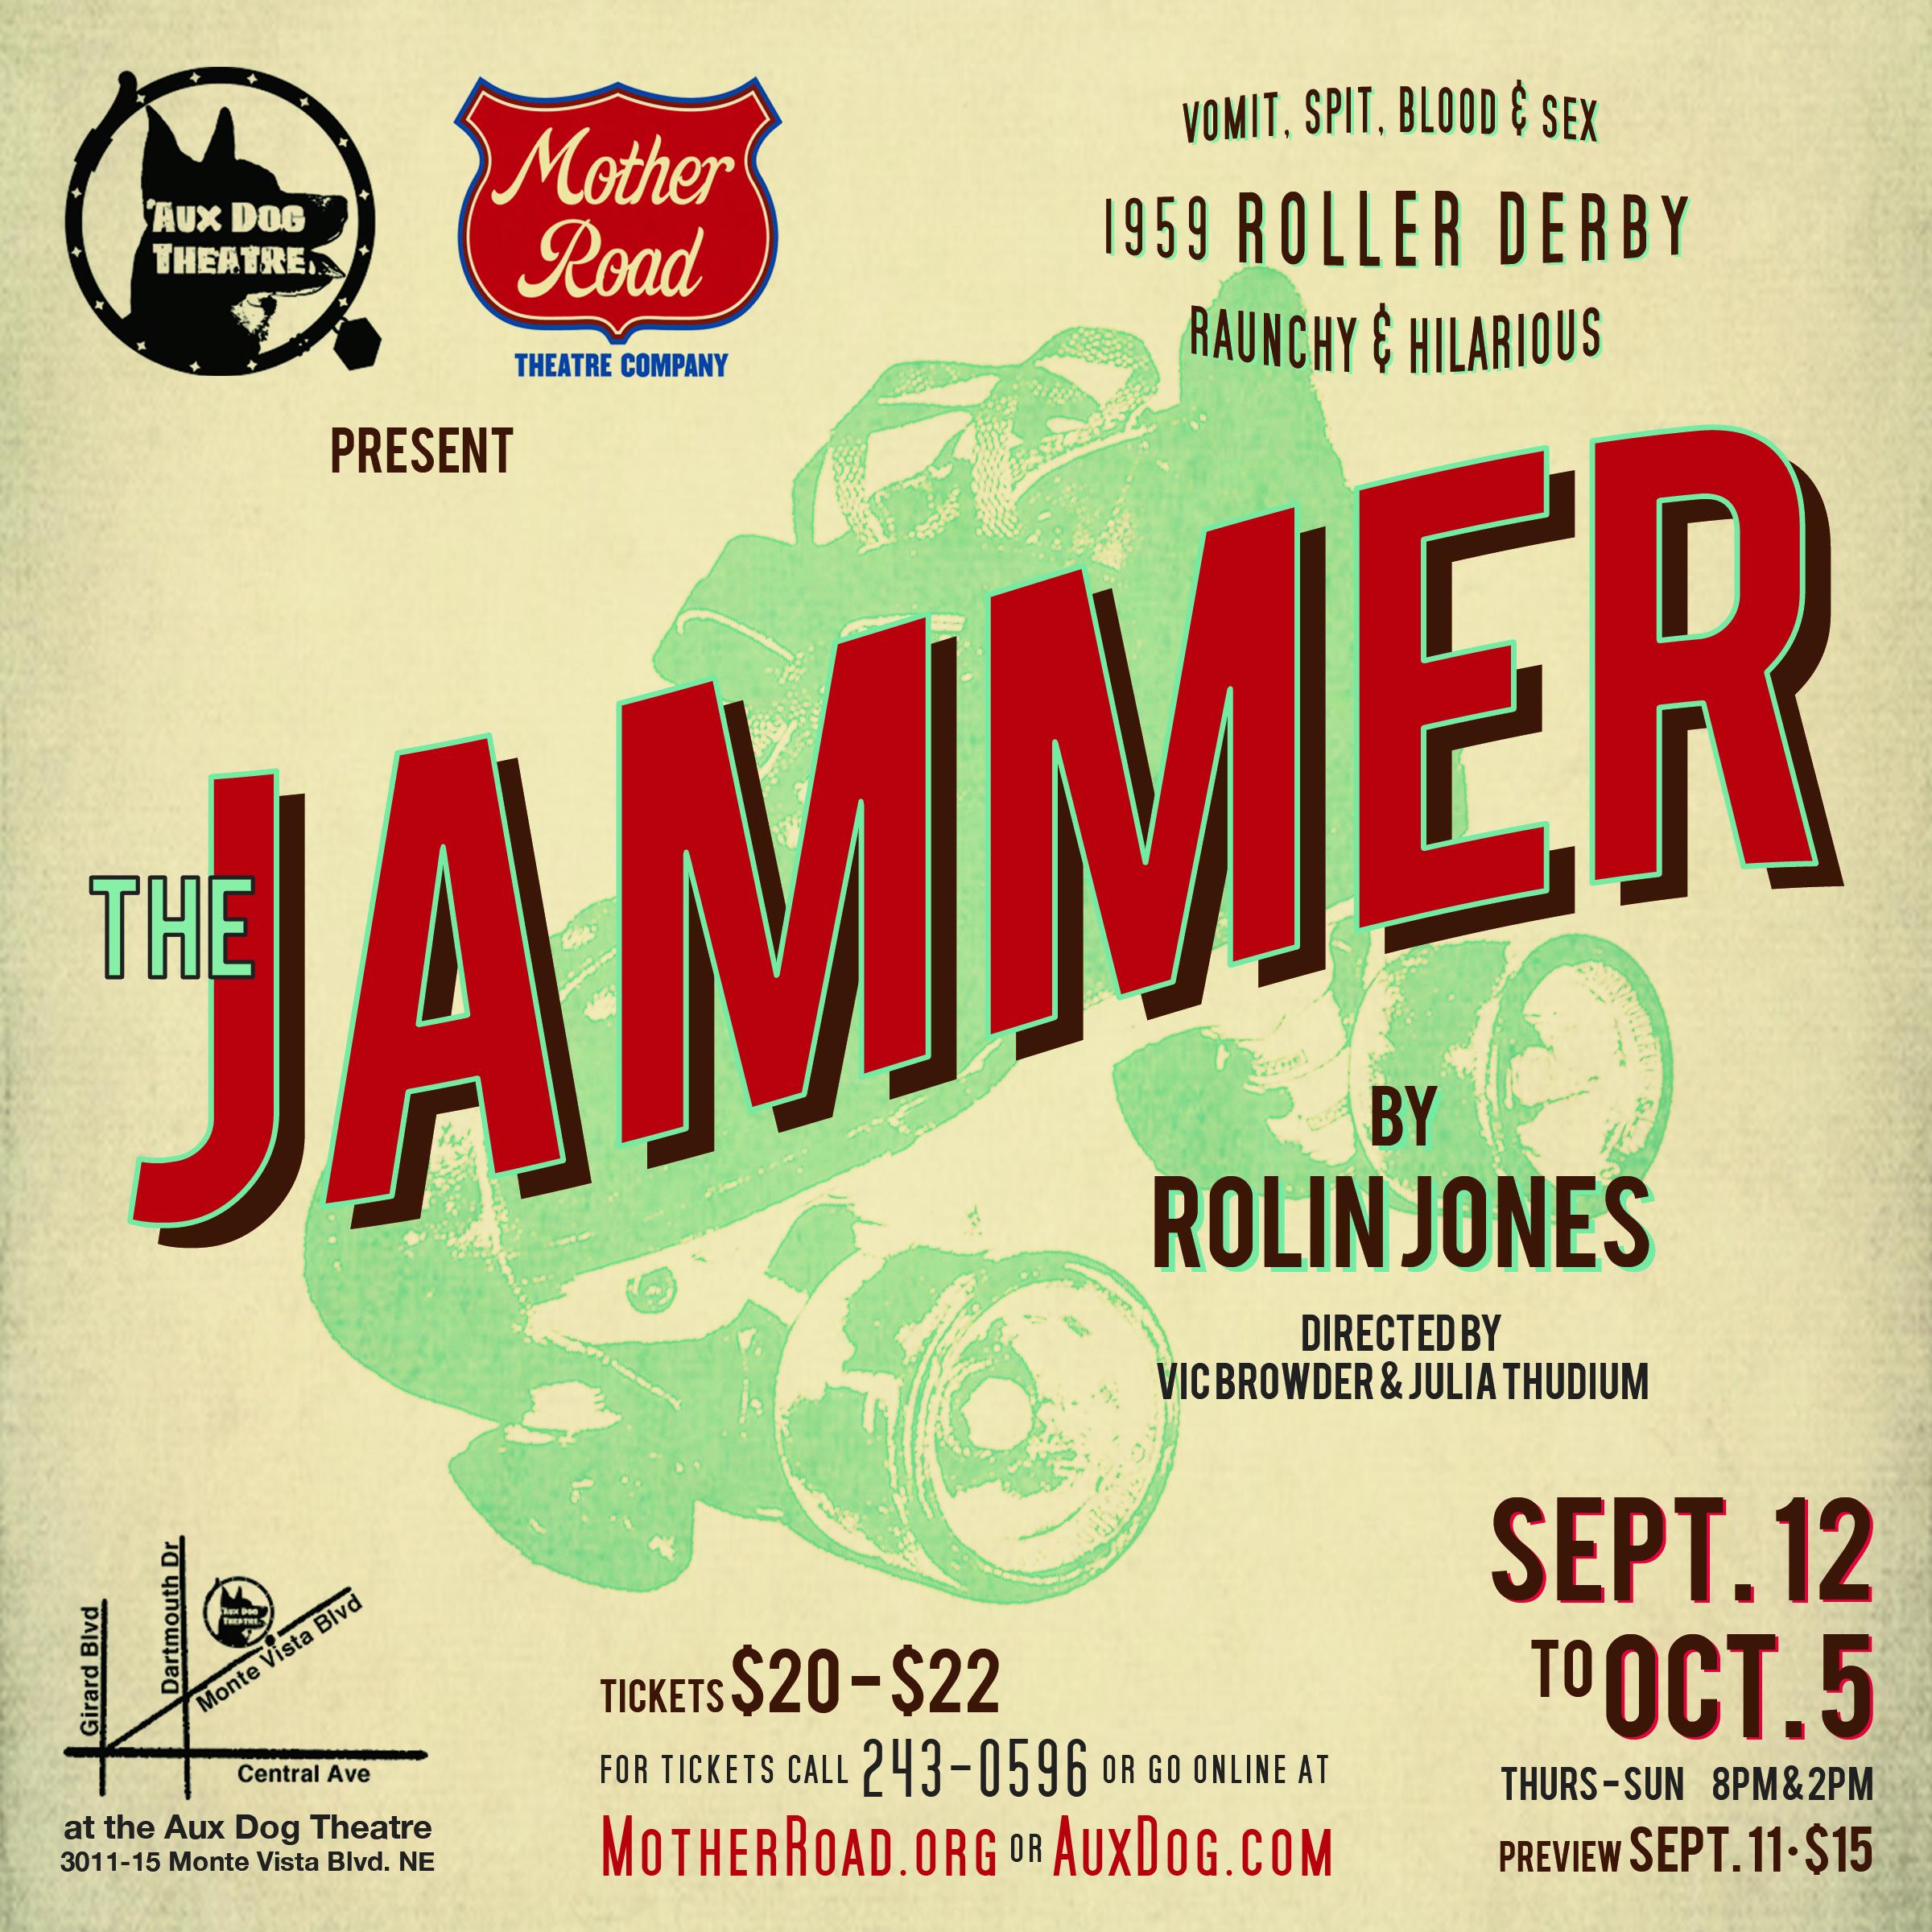 jammer poster take 4.jpg